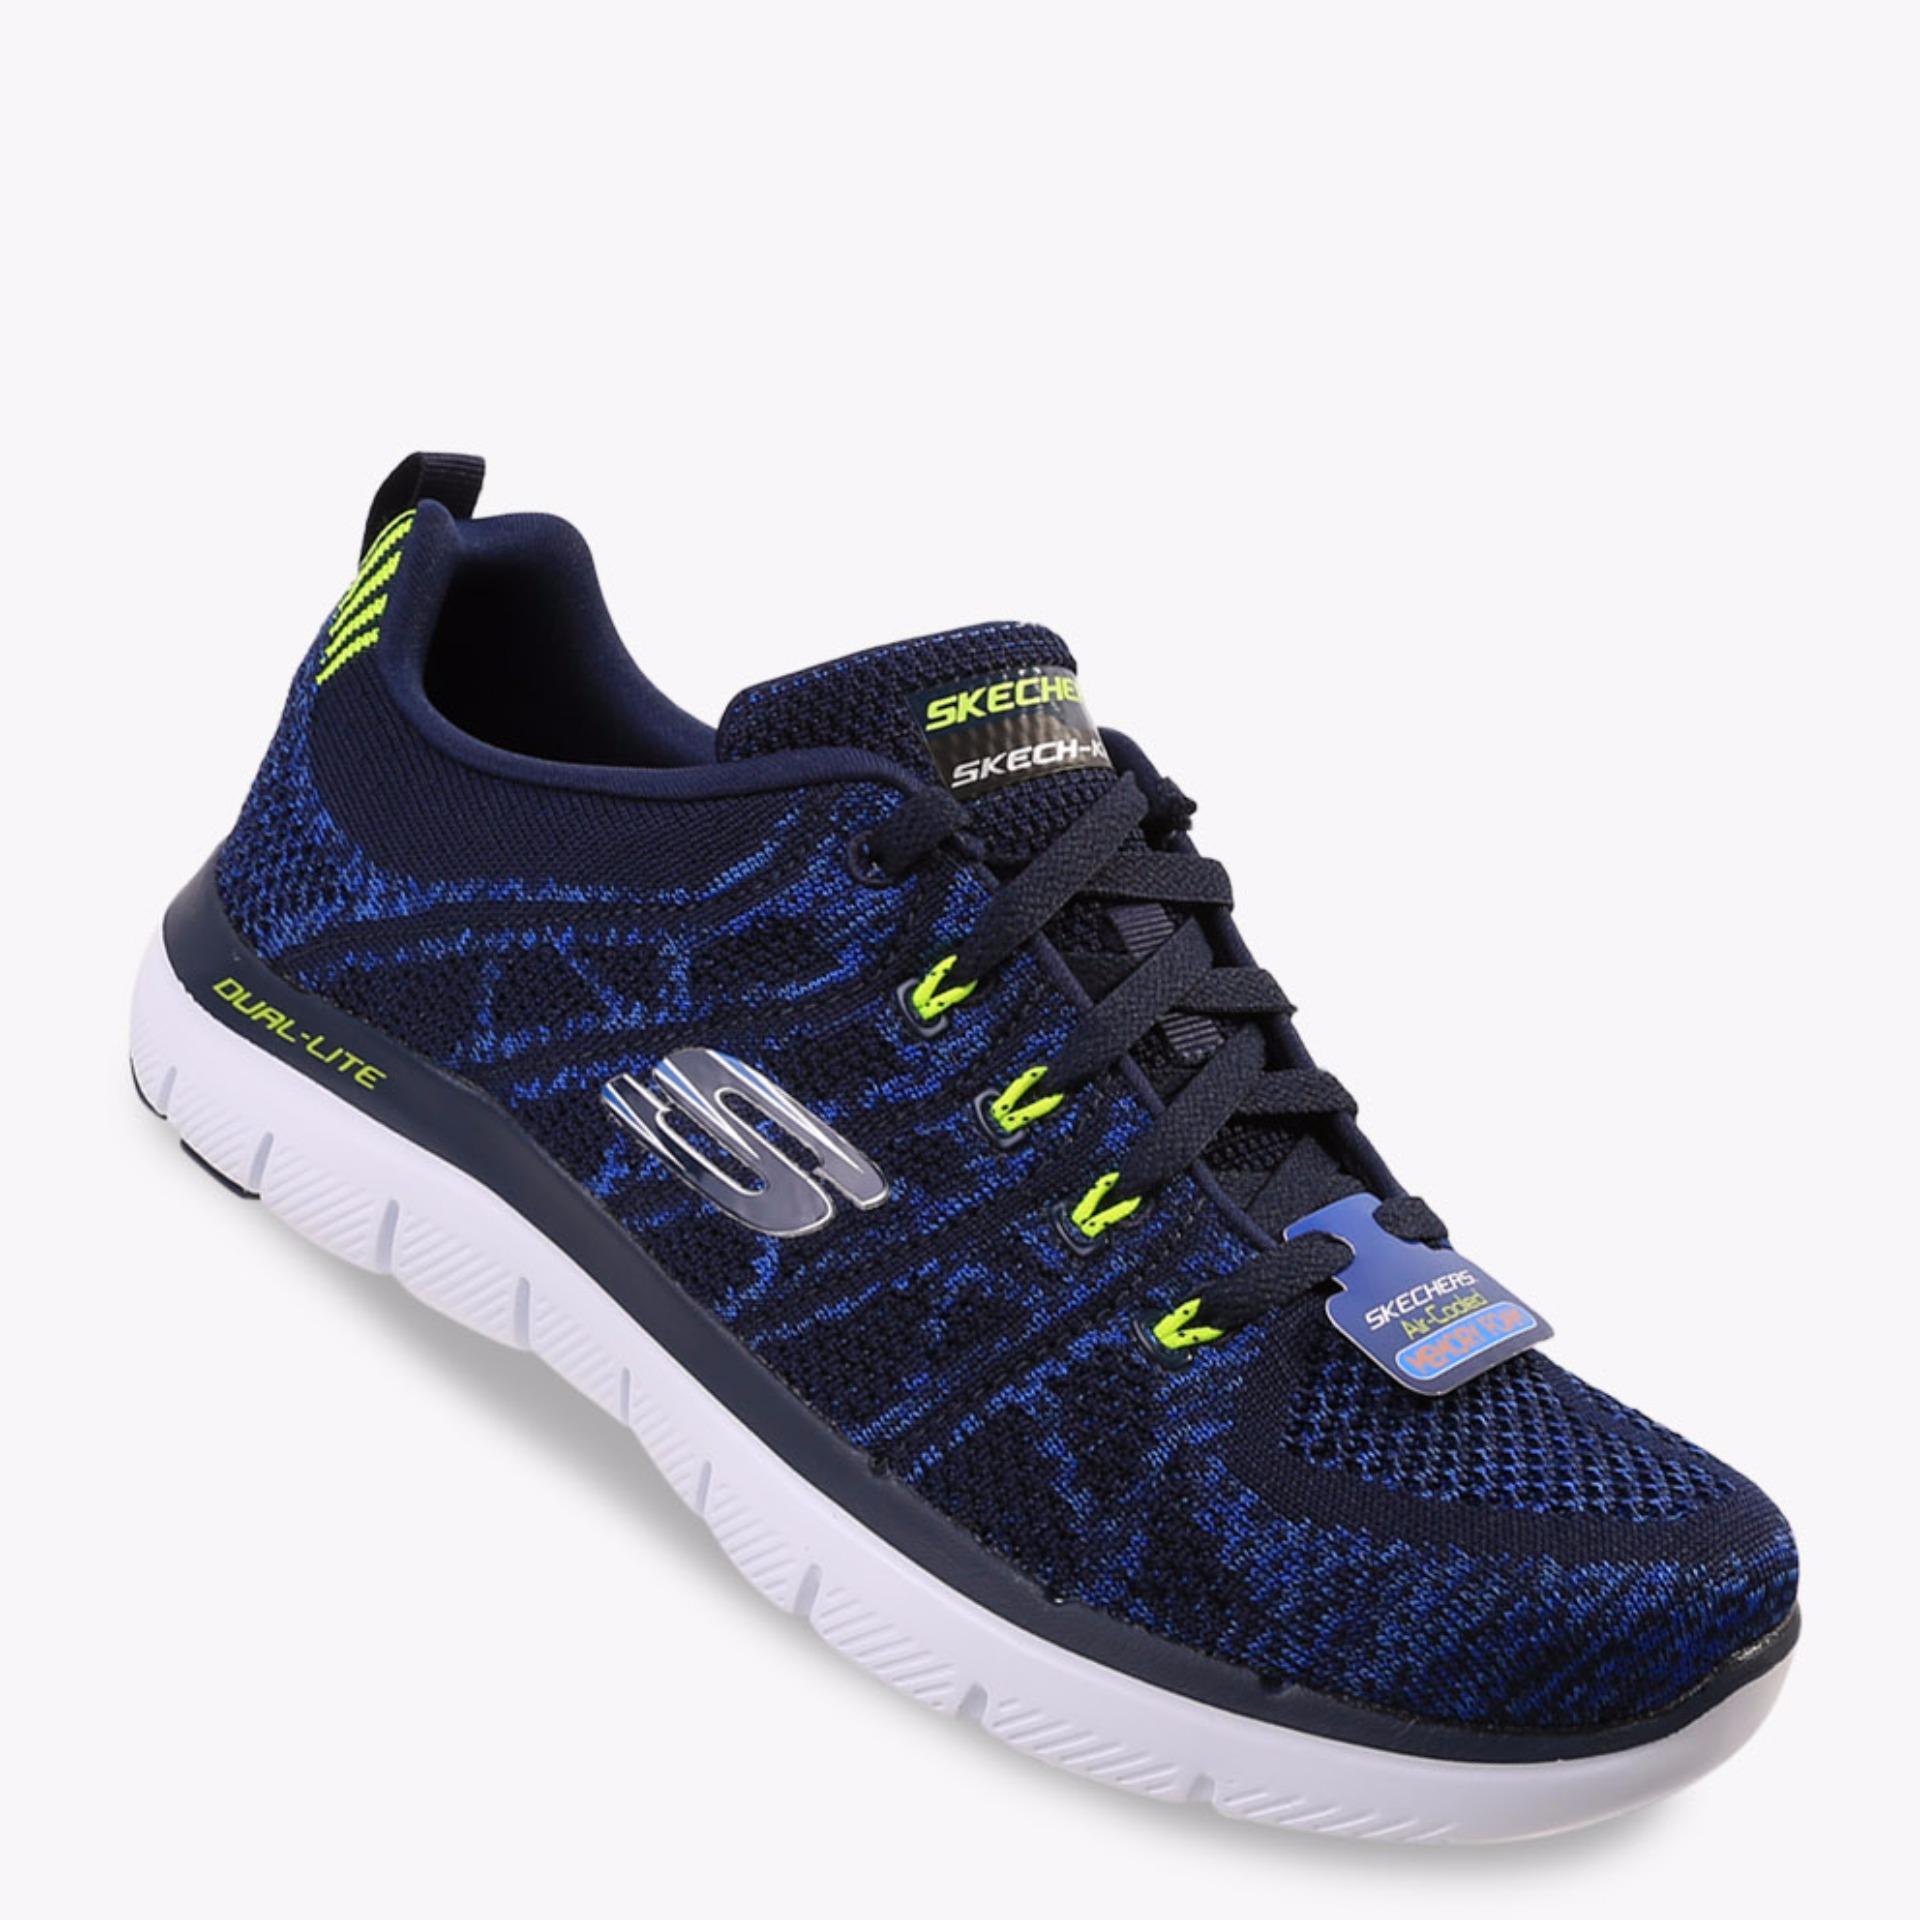 Harga Skechers Flex Advantage 2 Talamo Women S Sneakers Shoes Biru Yang Bagus